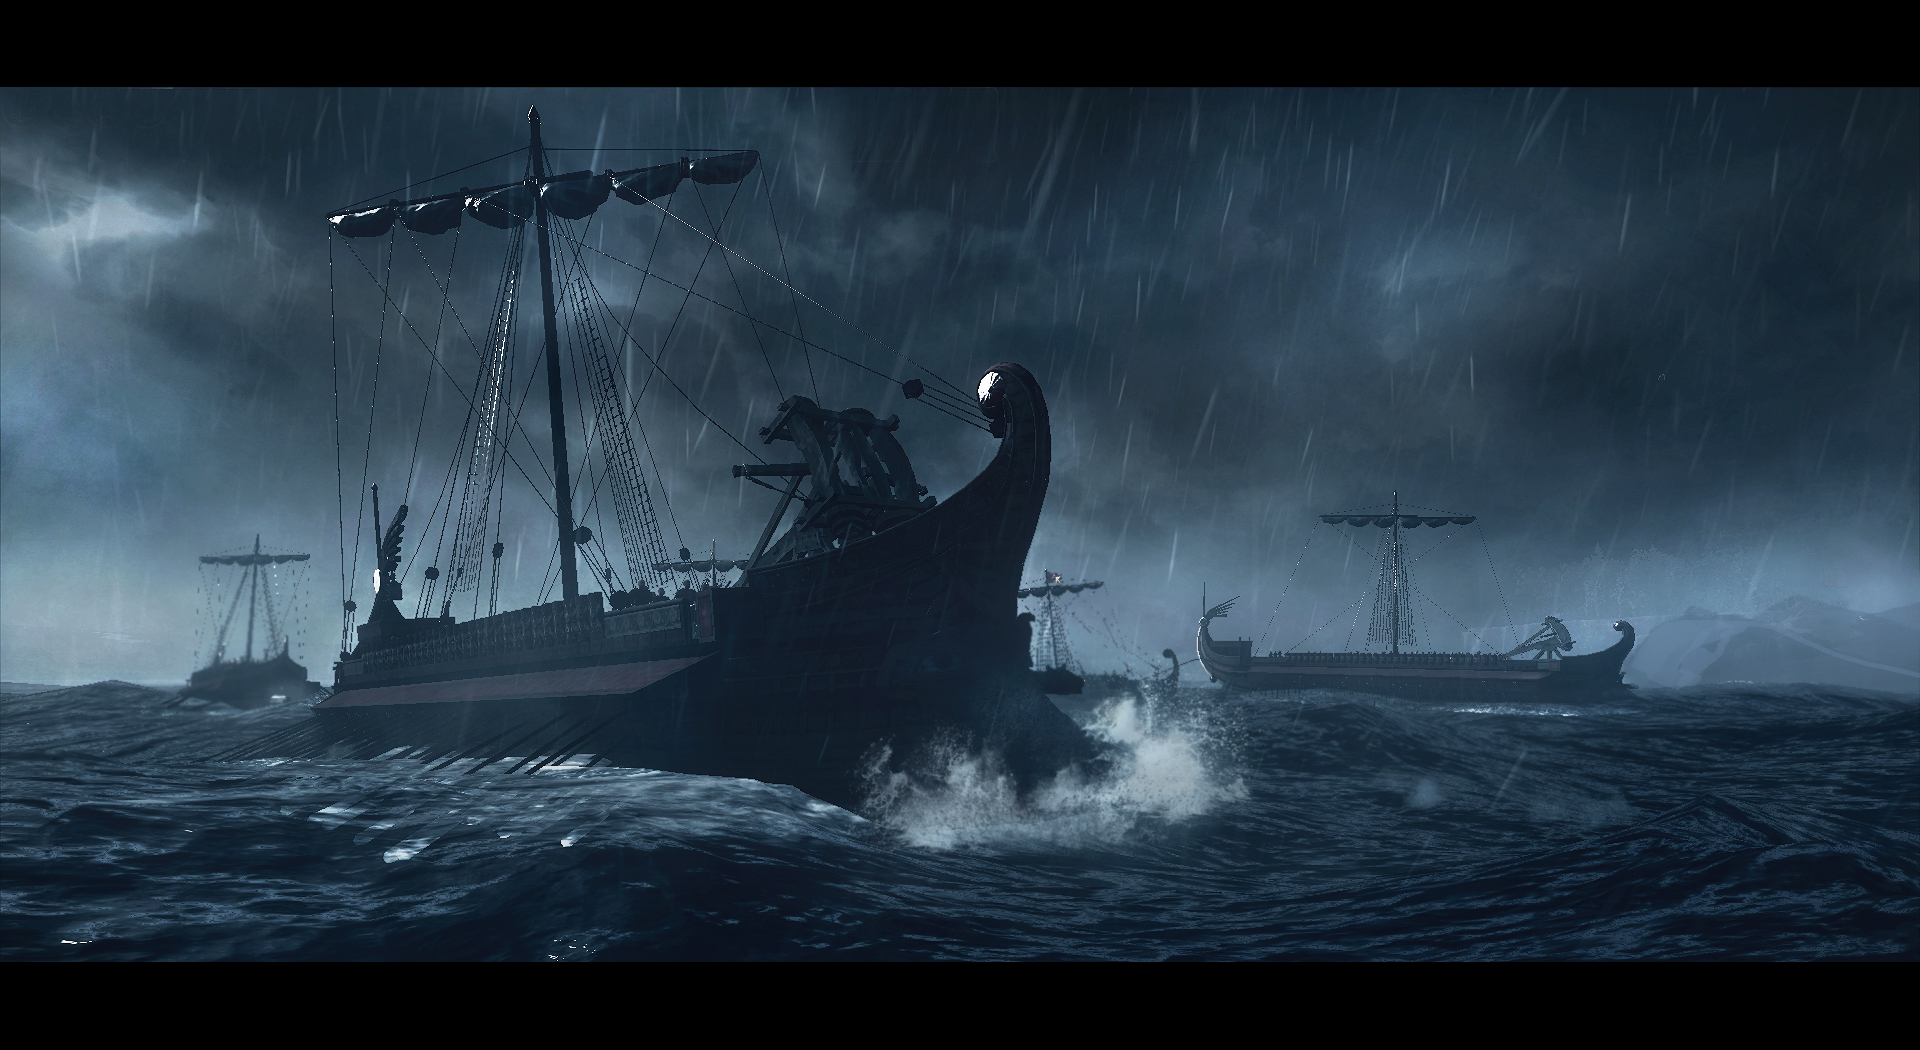 Heavy ballista ship by MalteBlom